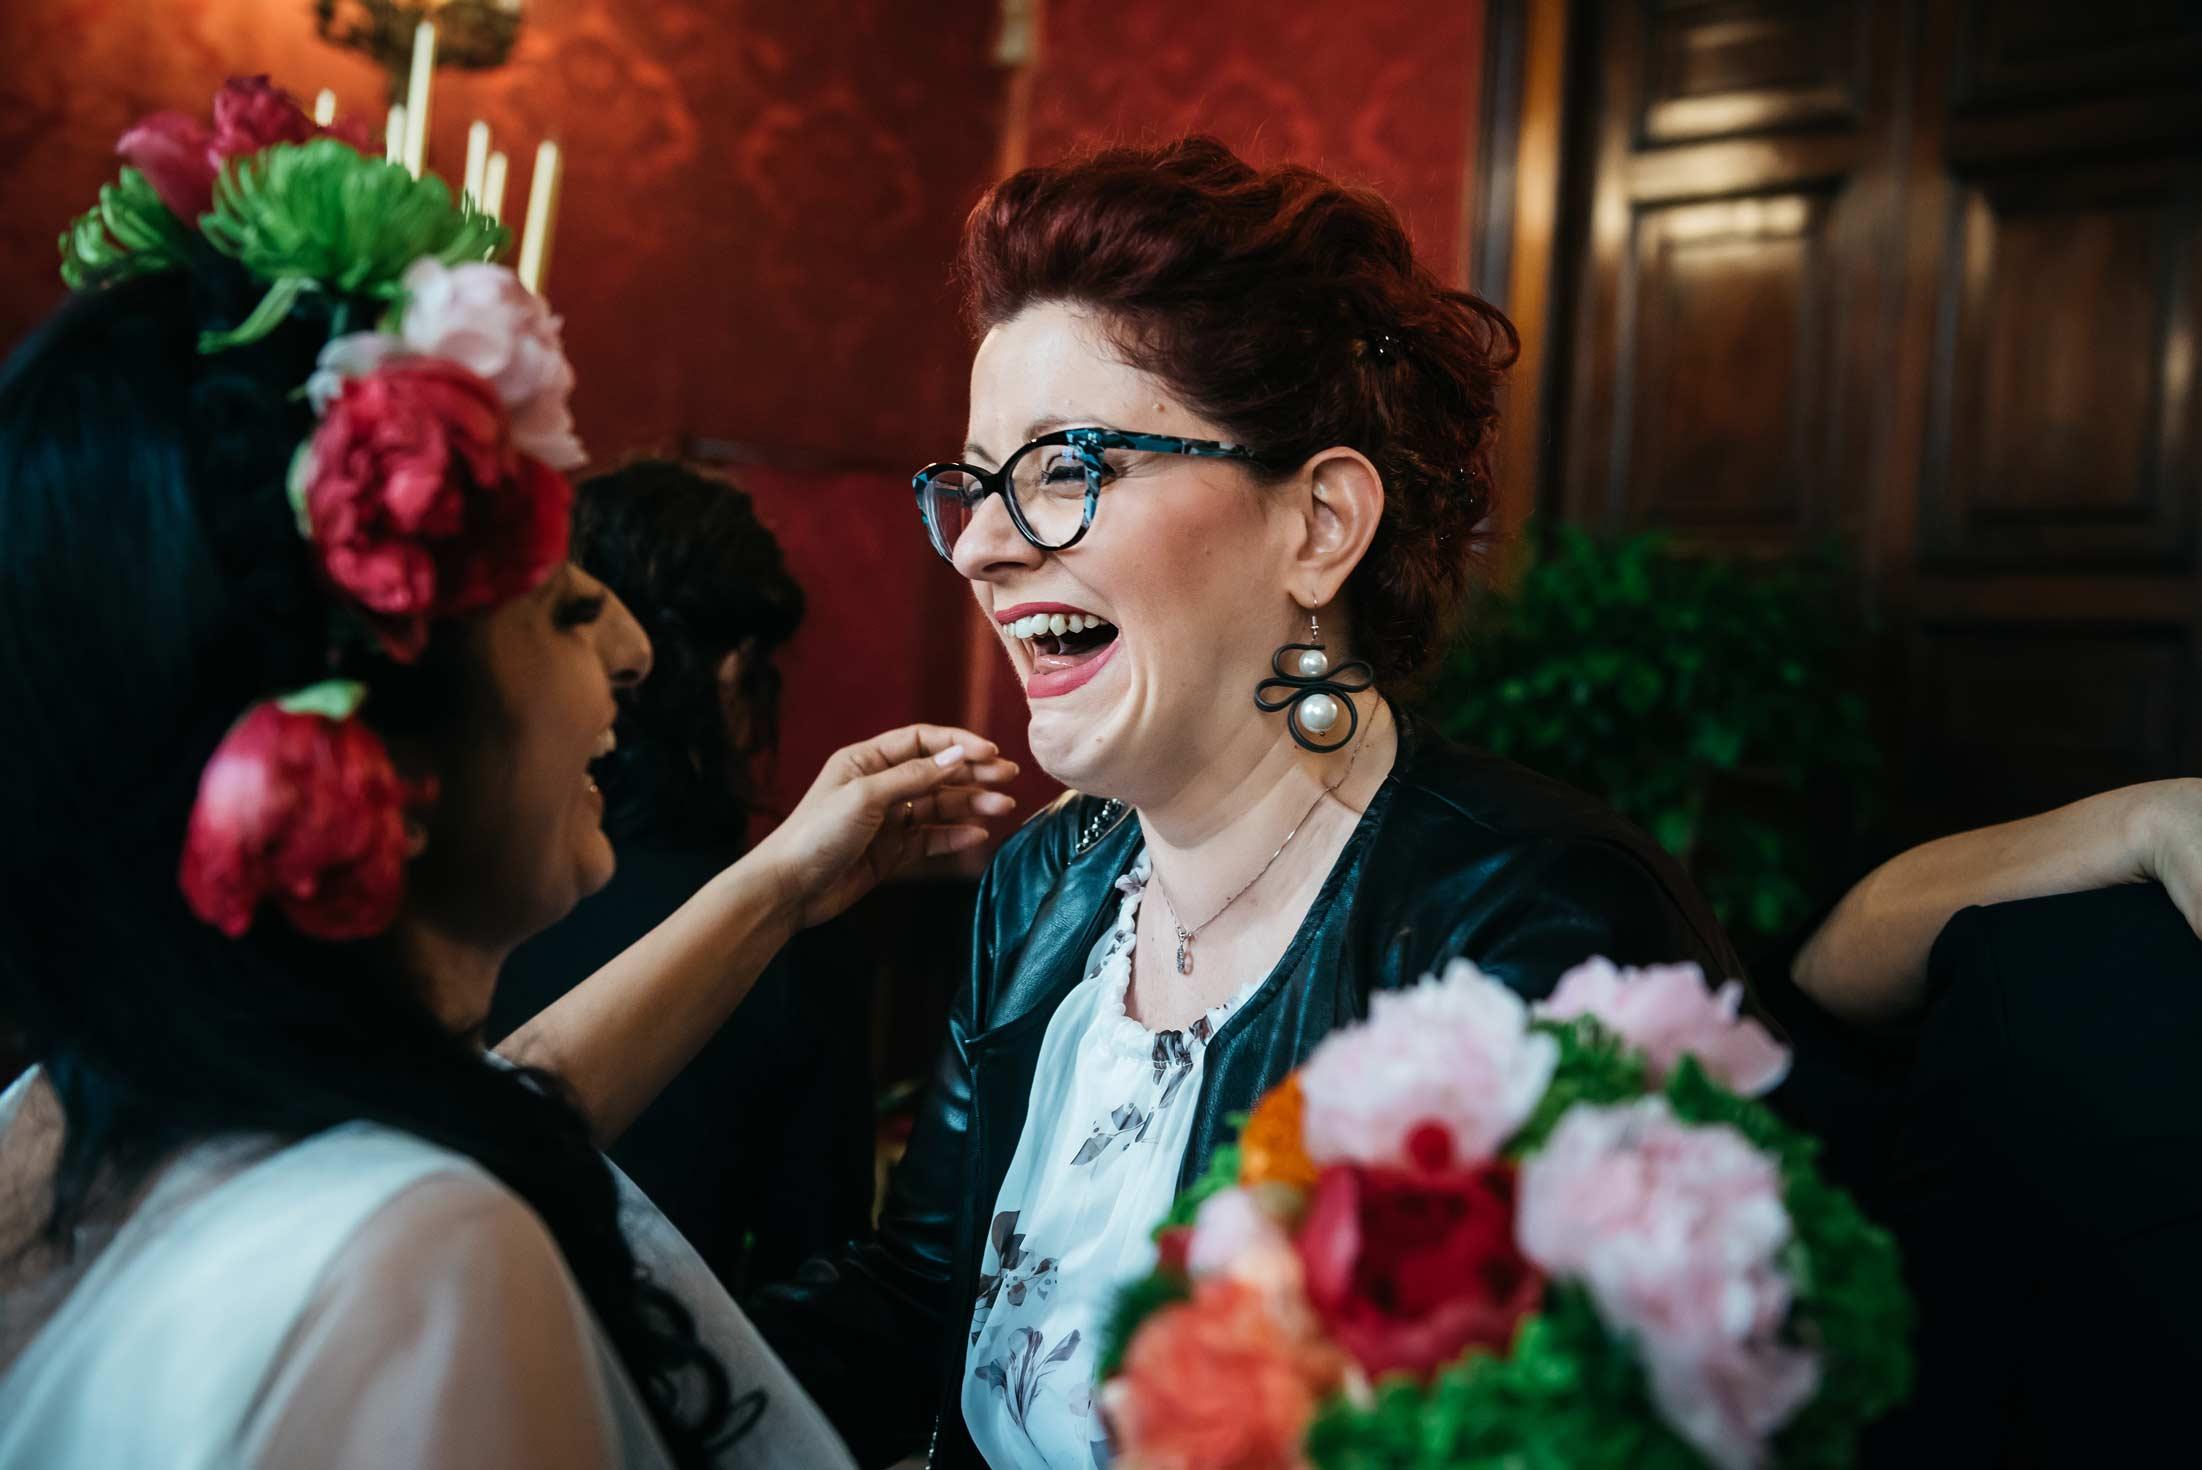 Reportage-Wedding-in-Rome-2-Ceremony